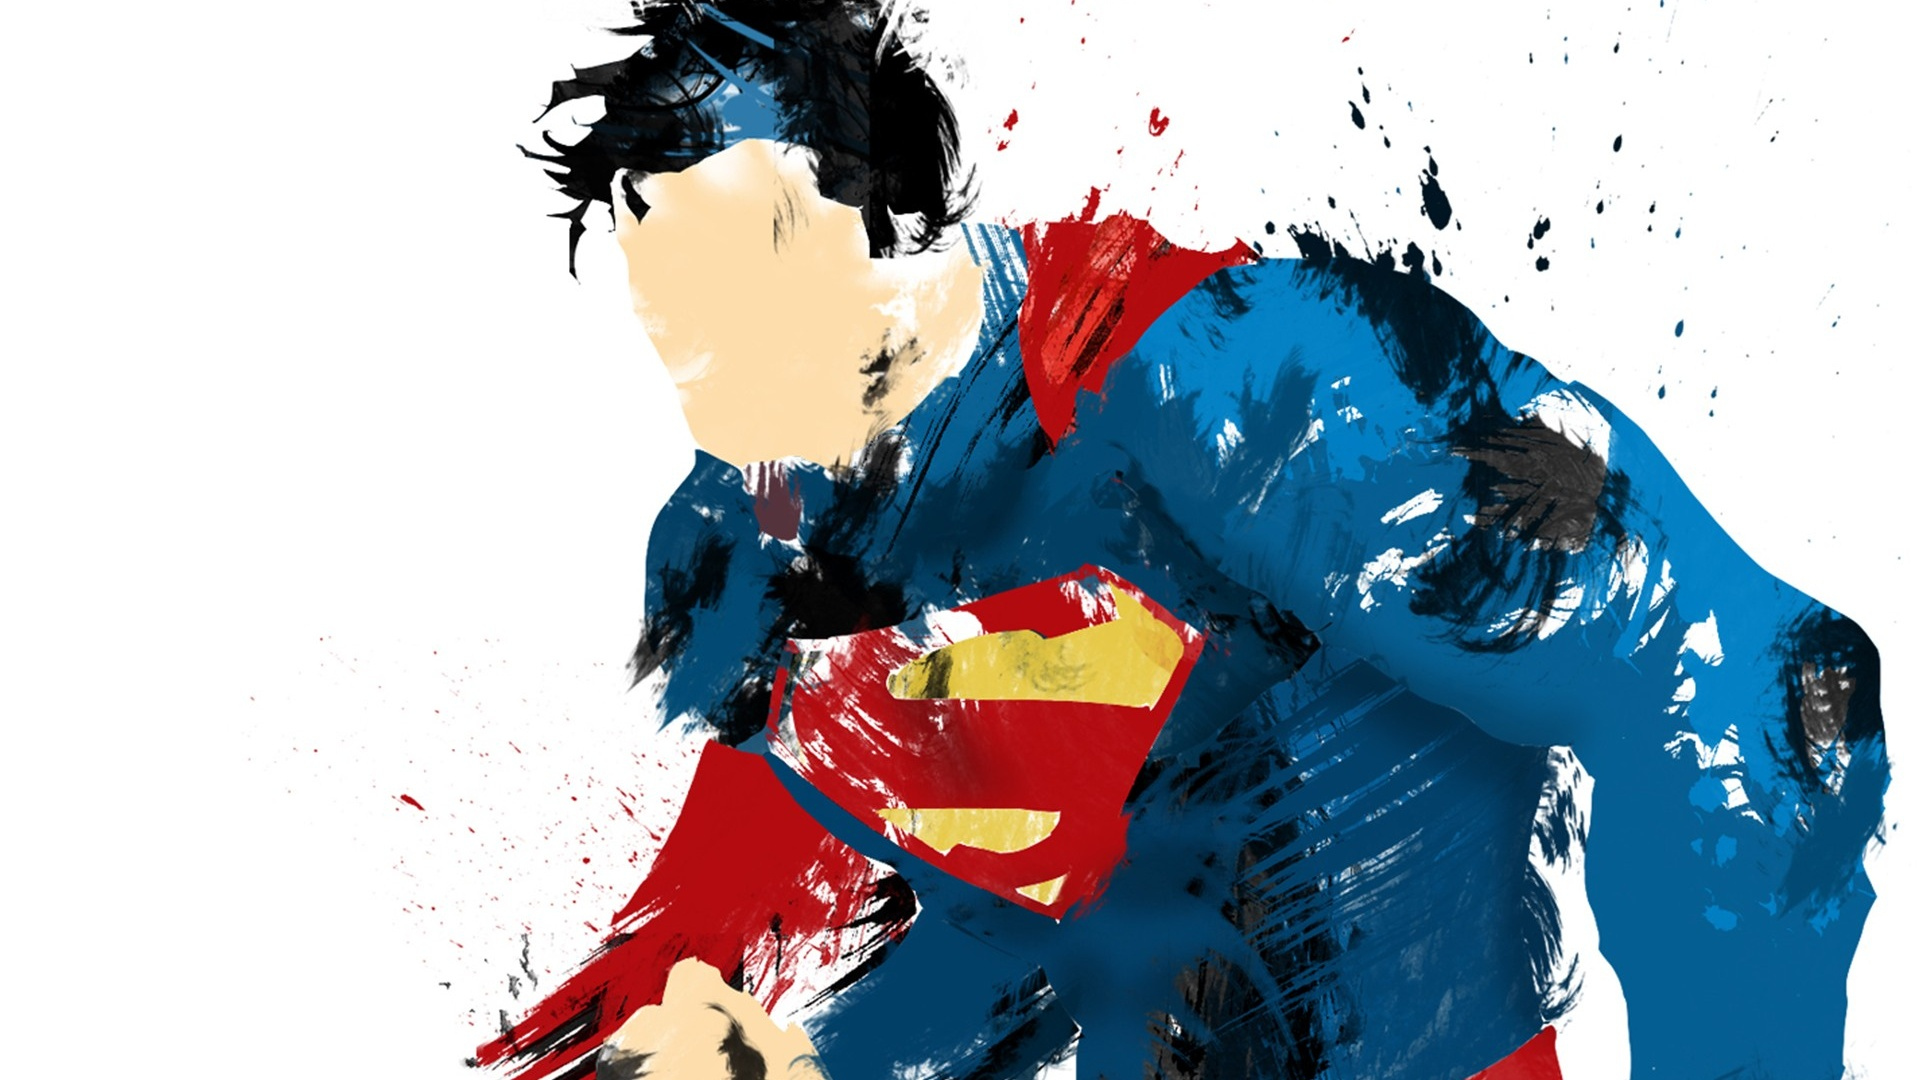 superman-9483-9833-hd-wallpapers